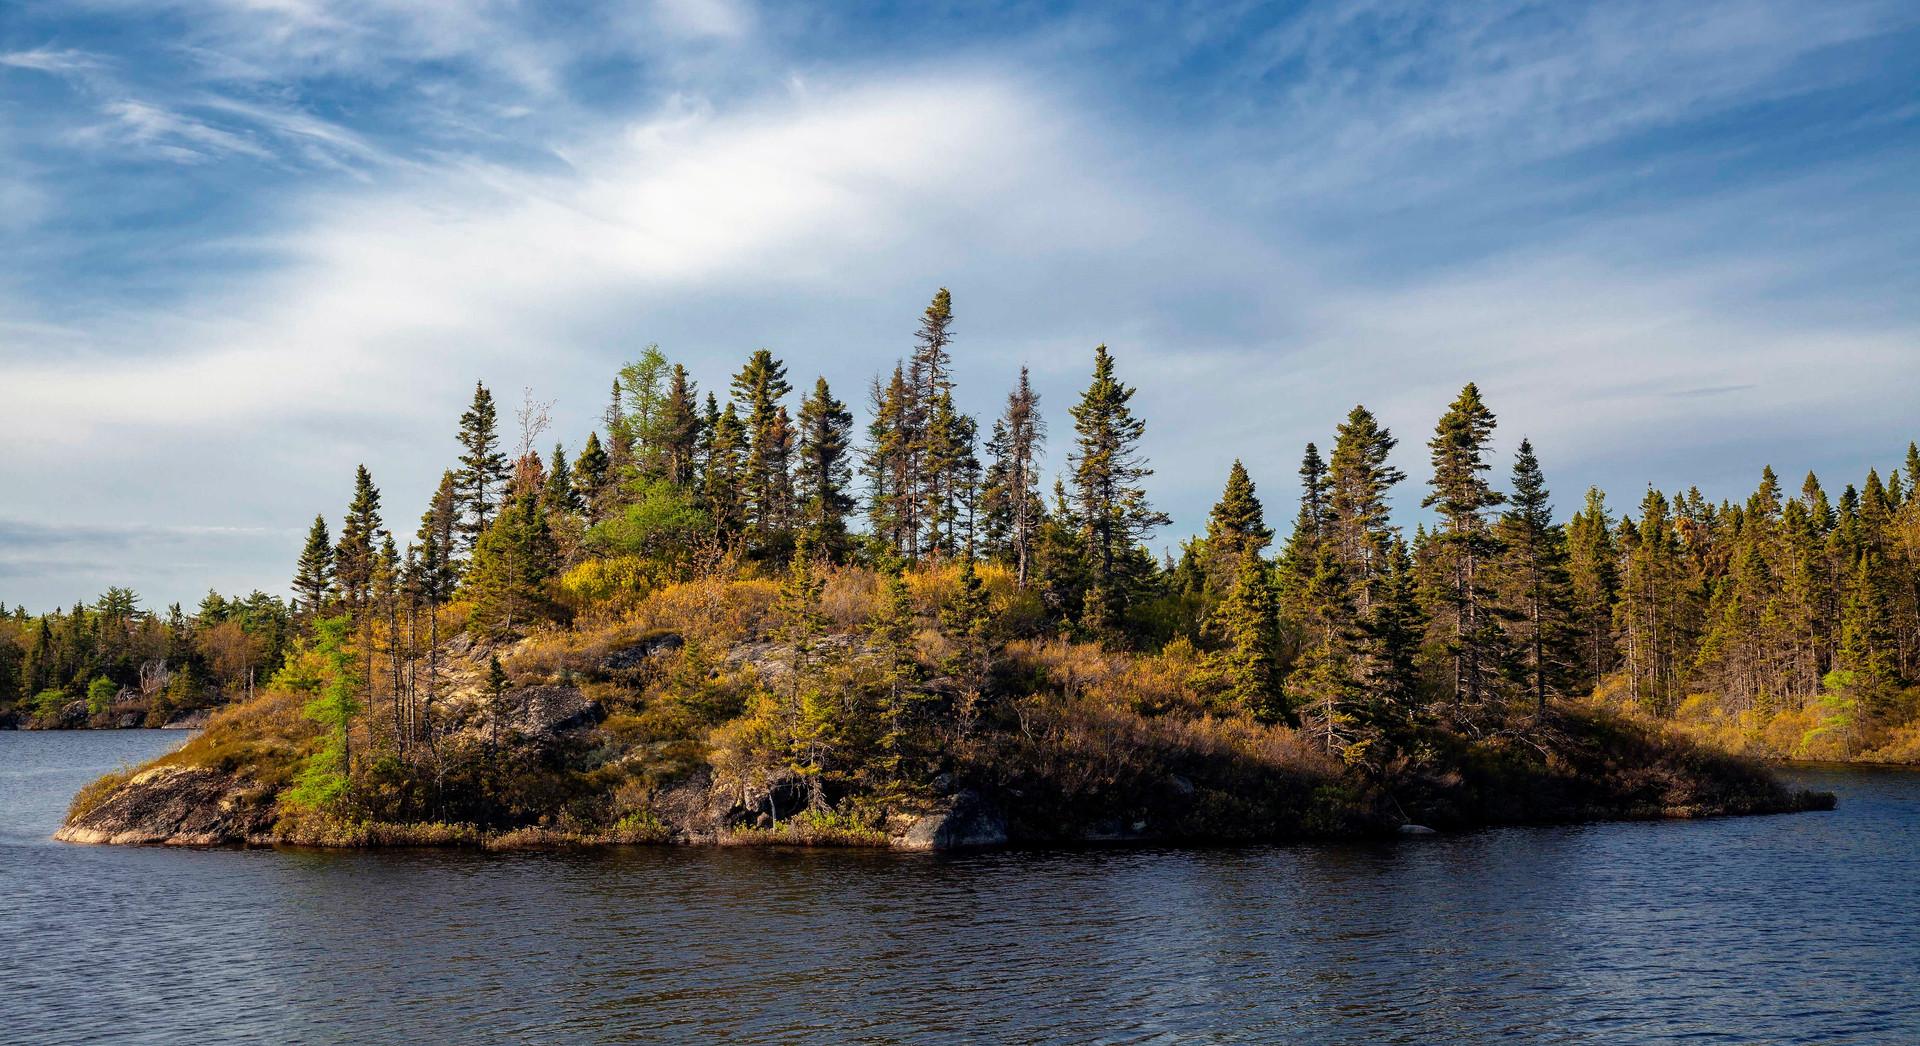 Irwin Barrett, Big Cranberry Lake & Island